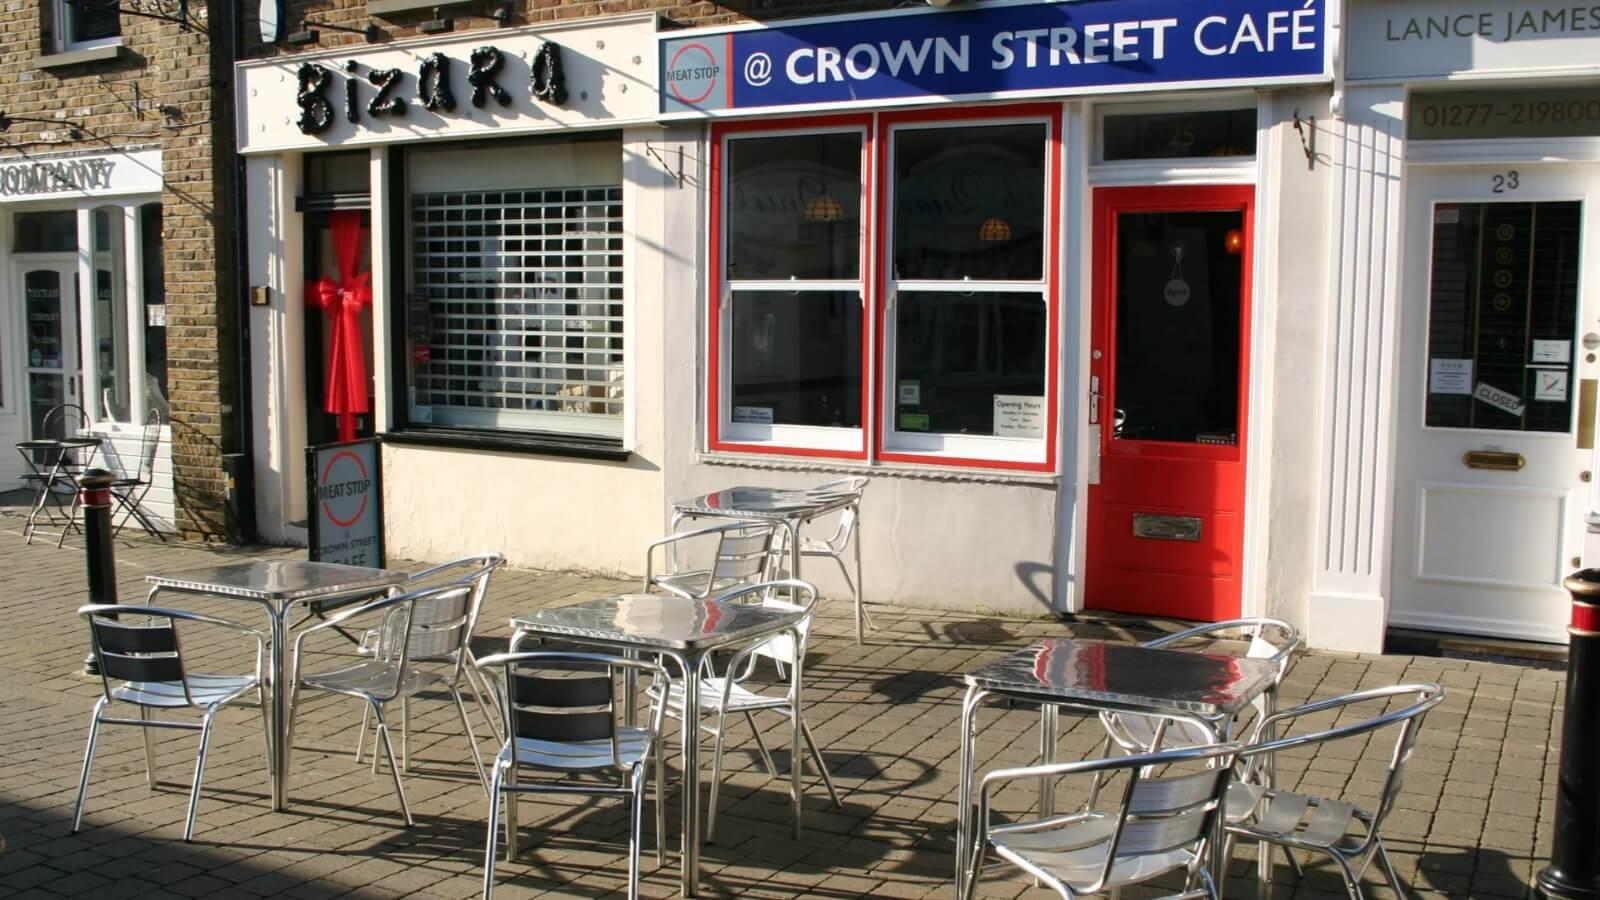 The Crown Street Café LTD